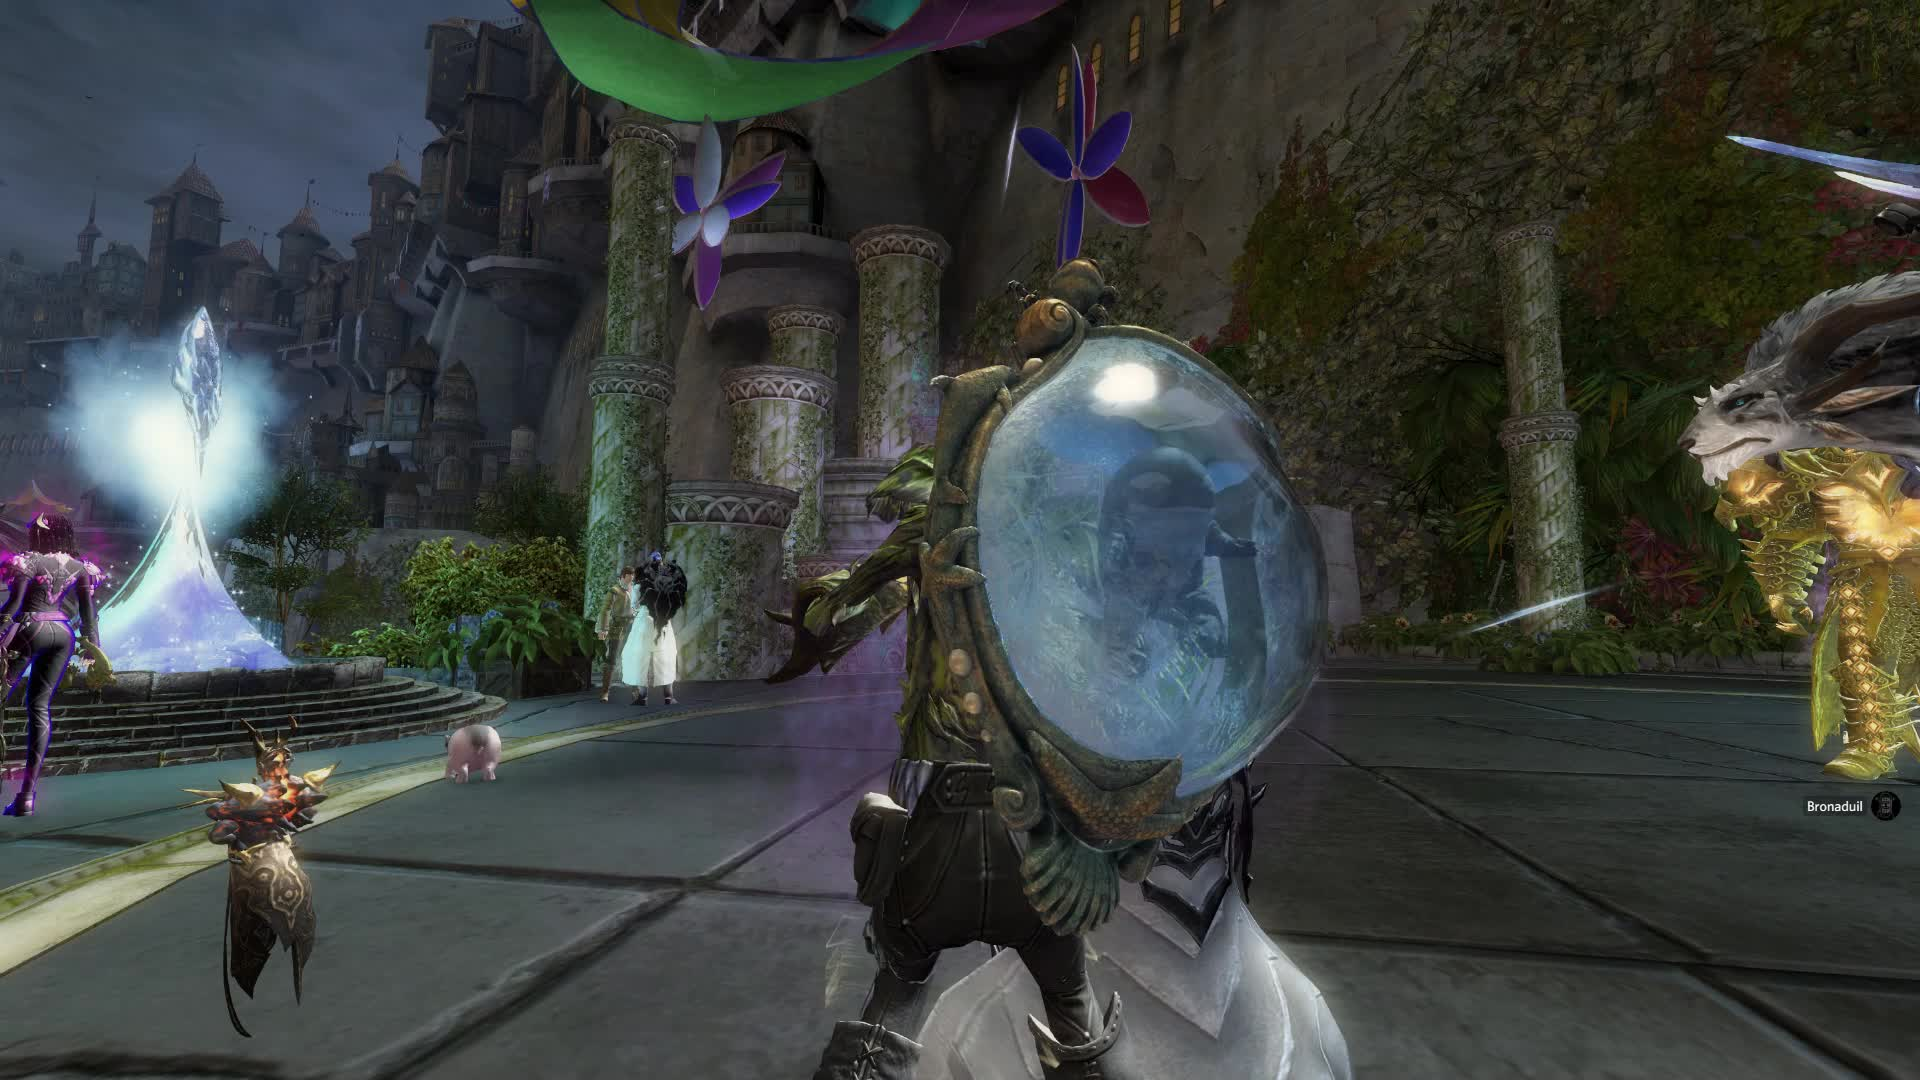 guildwars2, Guild Wars 2 2018.11.04 - 20.26.34.05 GIFs